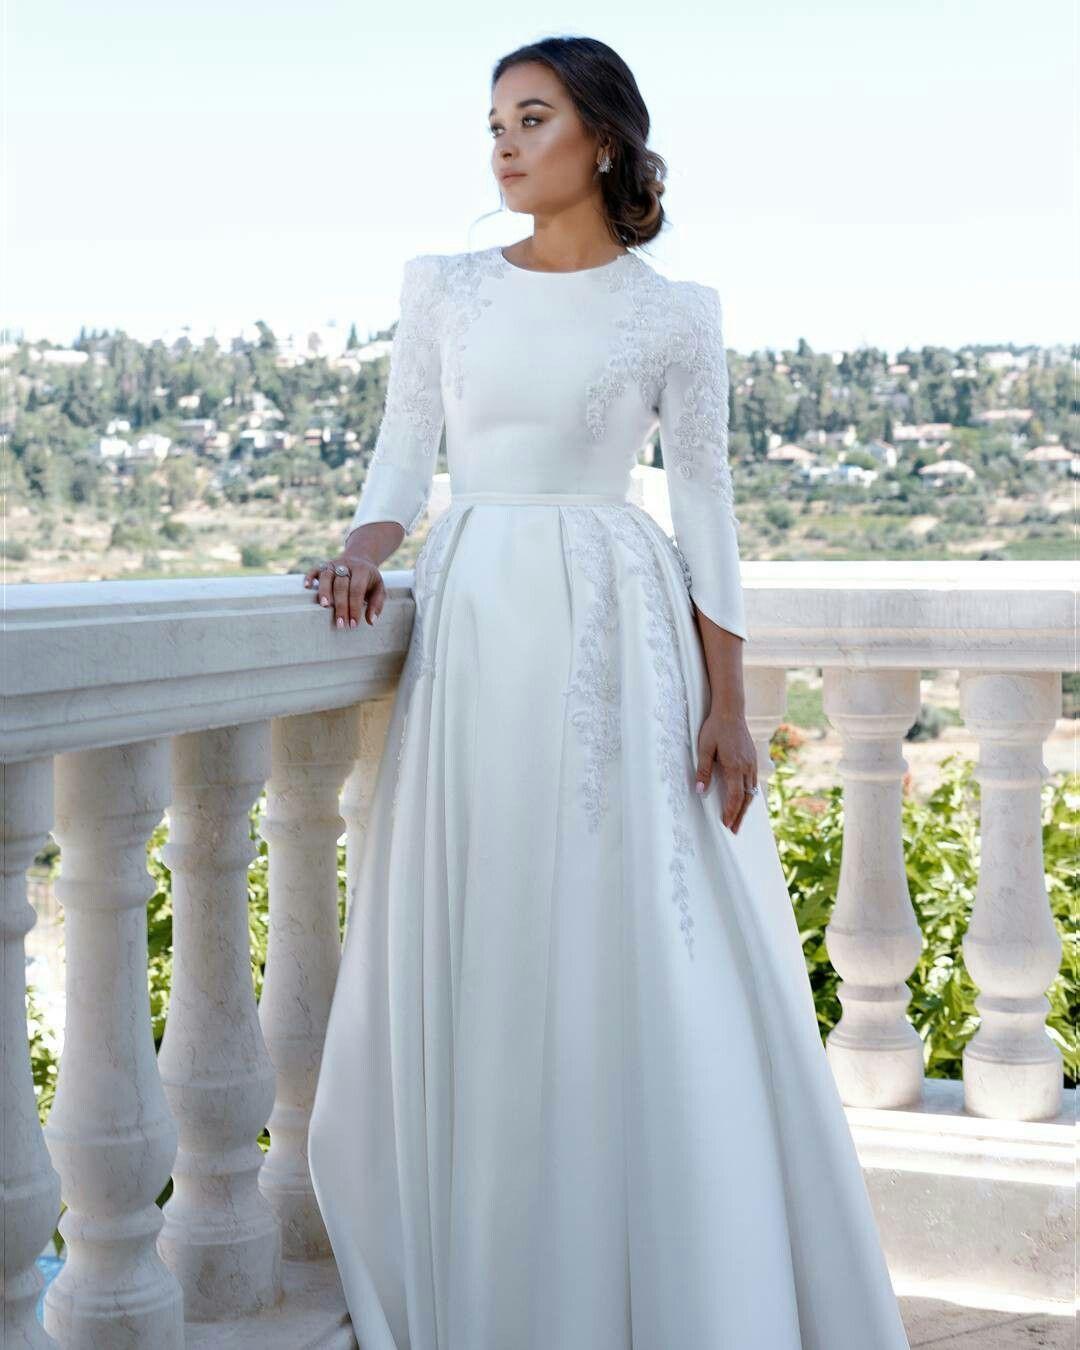 Pin By Roaida On Noivas Modestia Modest Wedding Dresses Winter Wedding Dress Wedding Dresses [ 1350 x 1080 Pixel ]